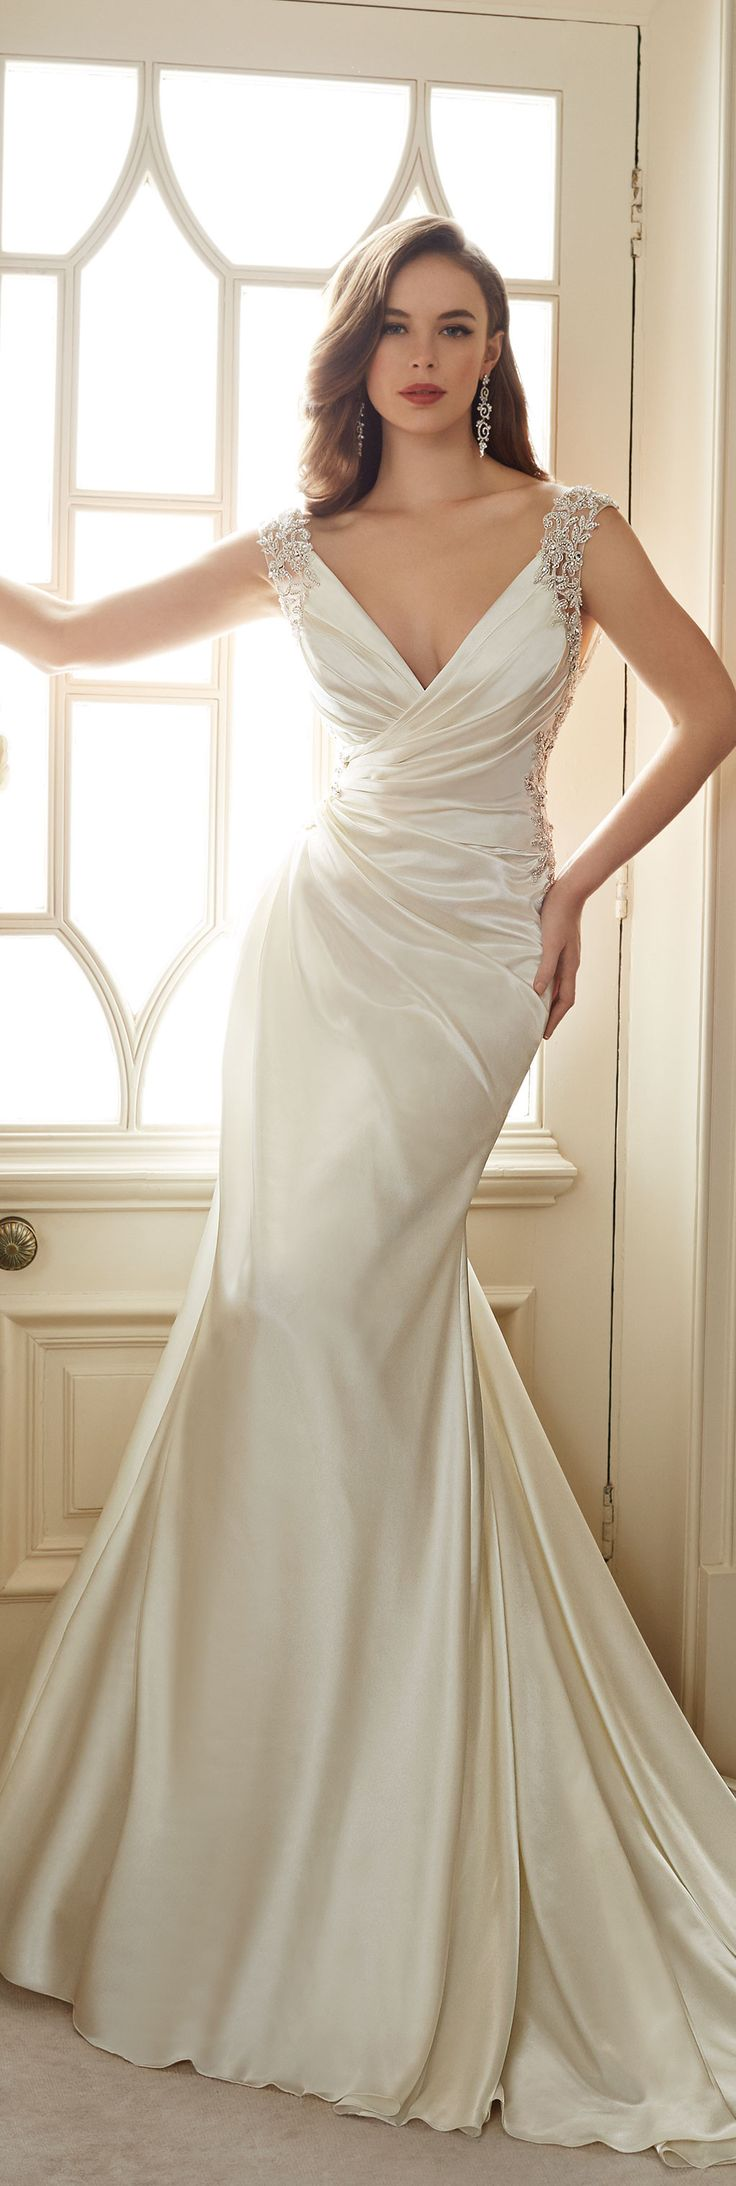 La sposa pandora wedding dress   best Wedding Dress Classic images on Pinterest  Wedding frocks